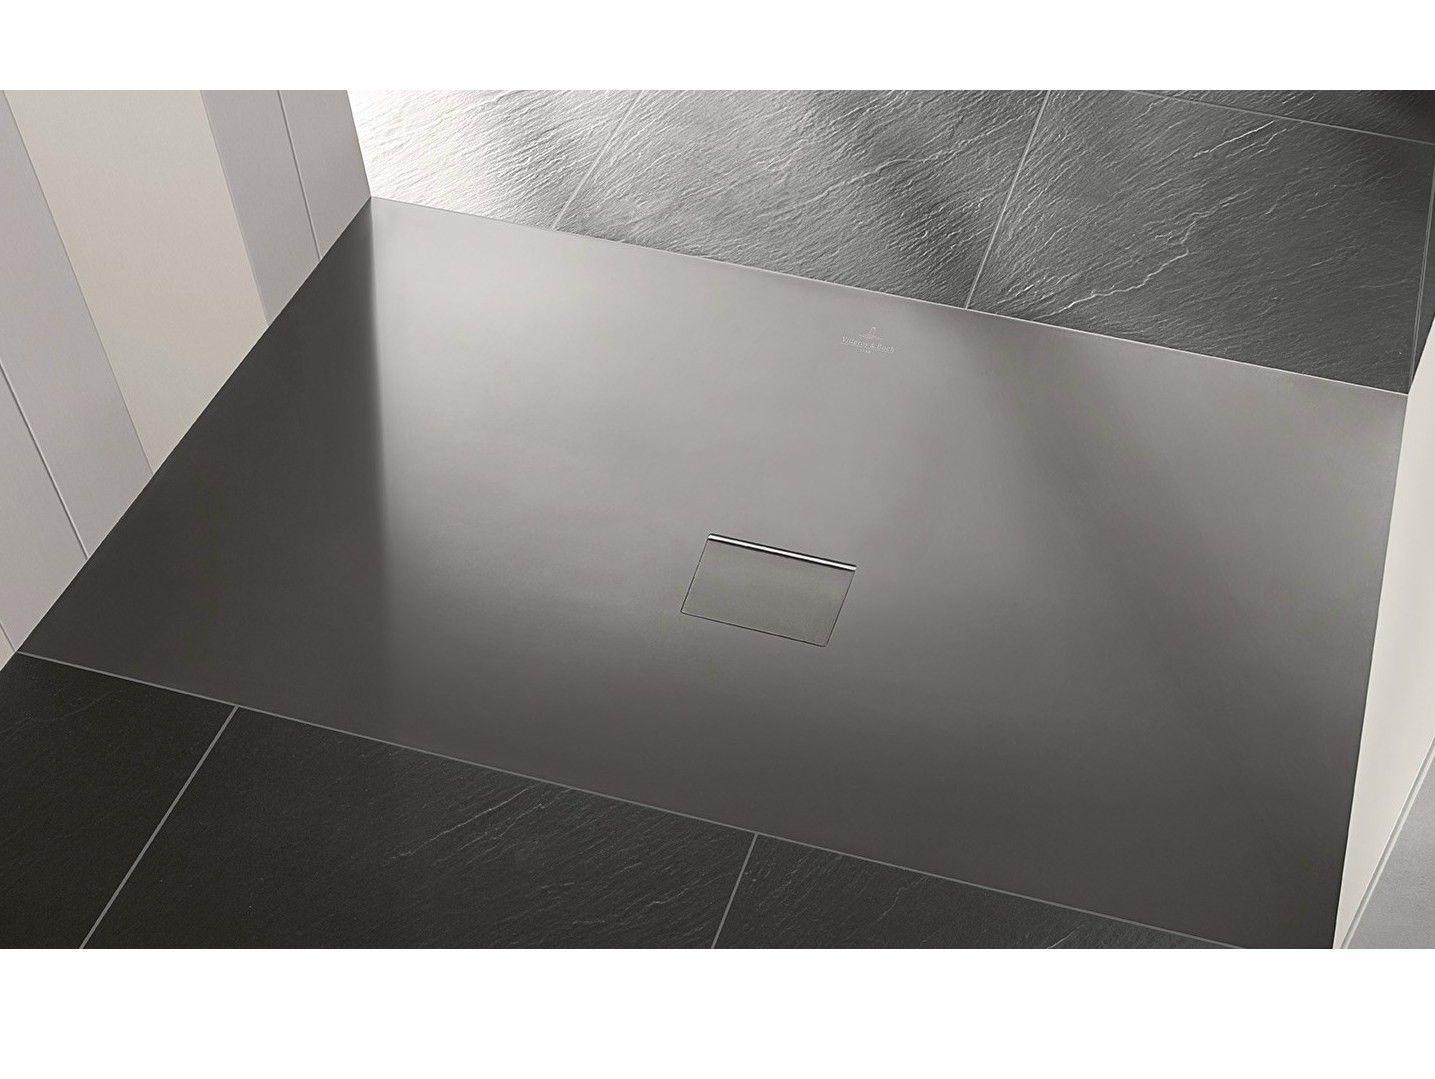 Quaryl Shower Tray Squaro Infinity By Villeroy Boch Shower Tray Villeroy Boch